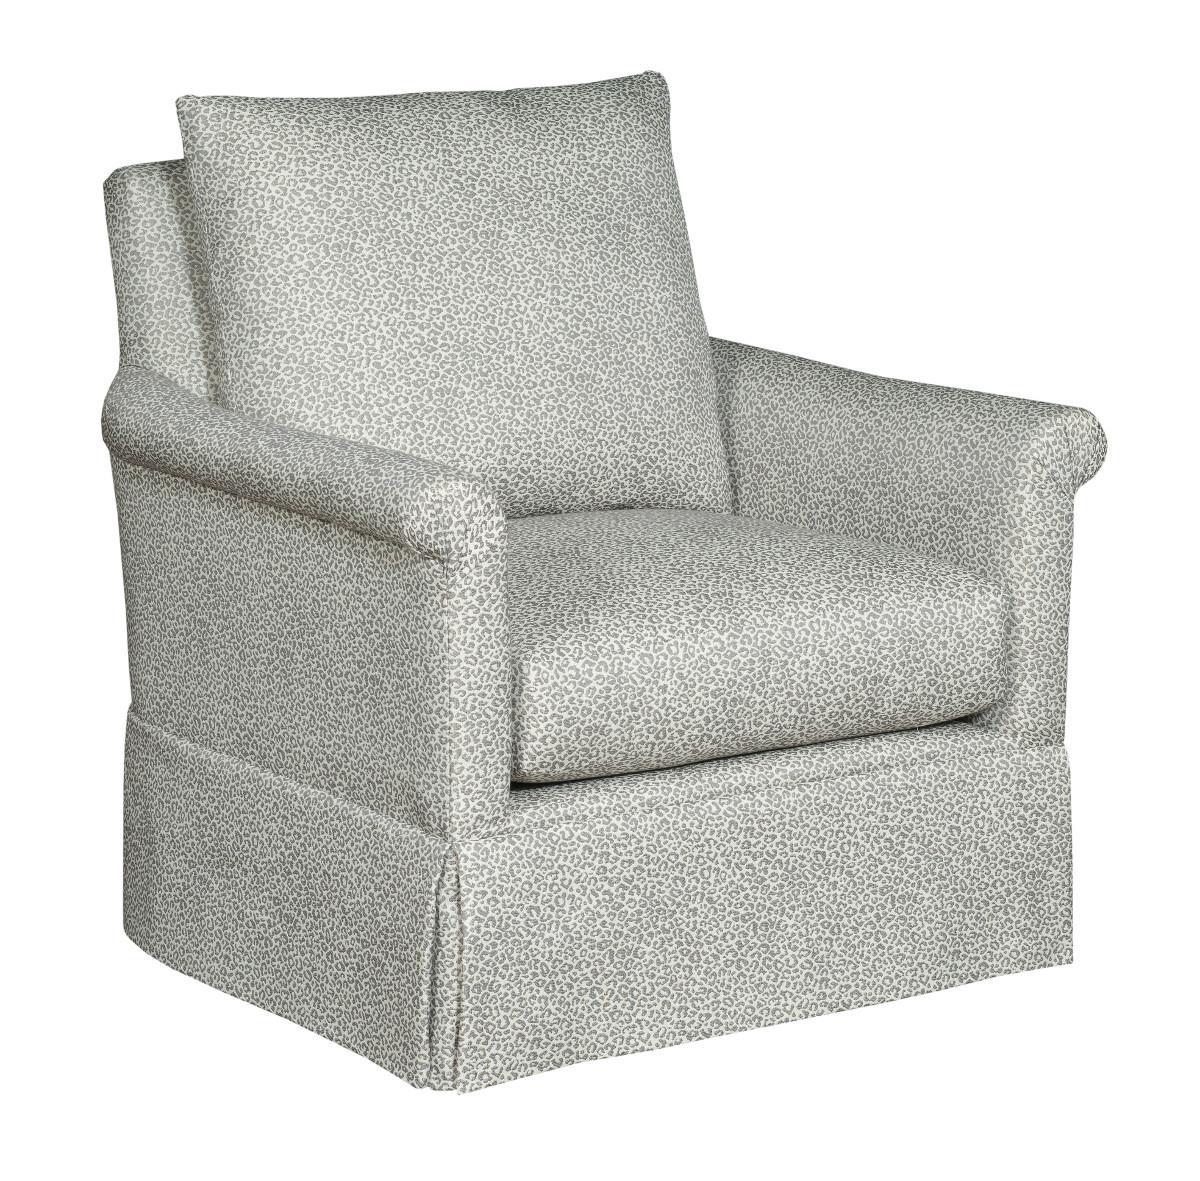 Kincaid Furniture Modern Select Chair - Item Number: X12-84-MalindiCharcoal